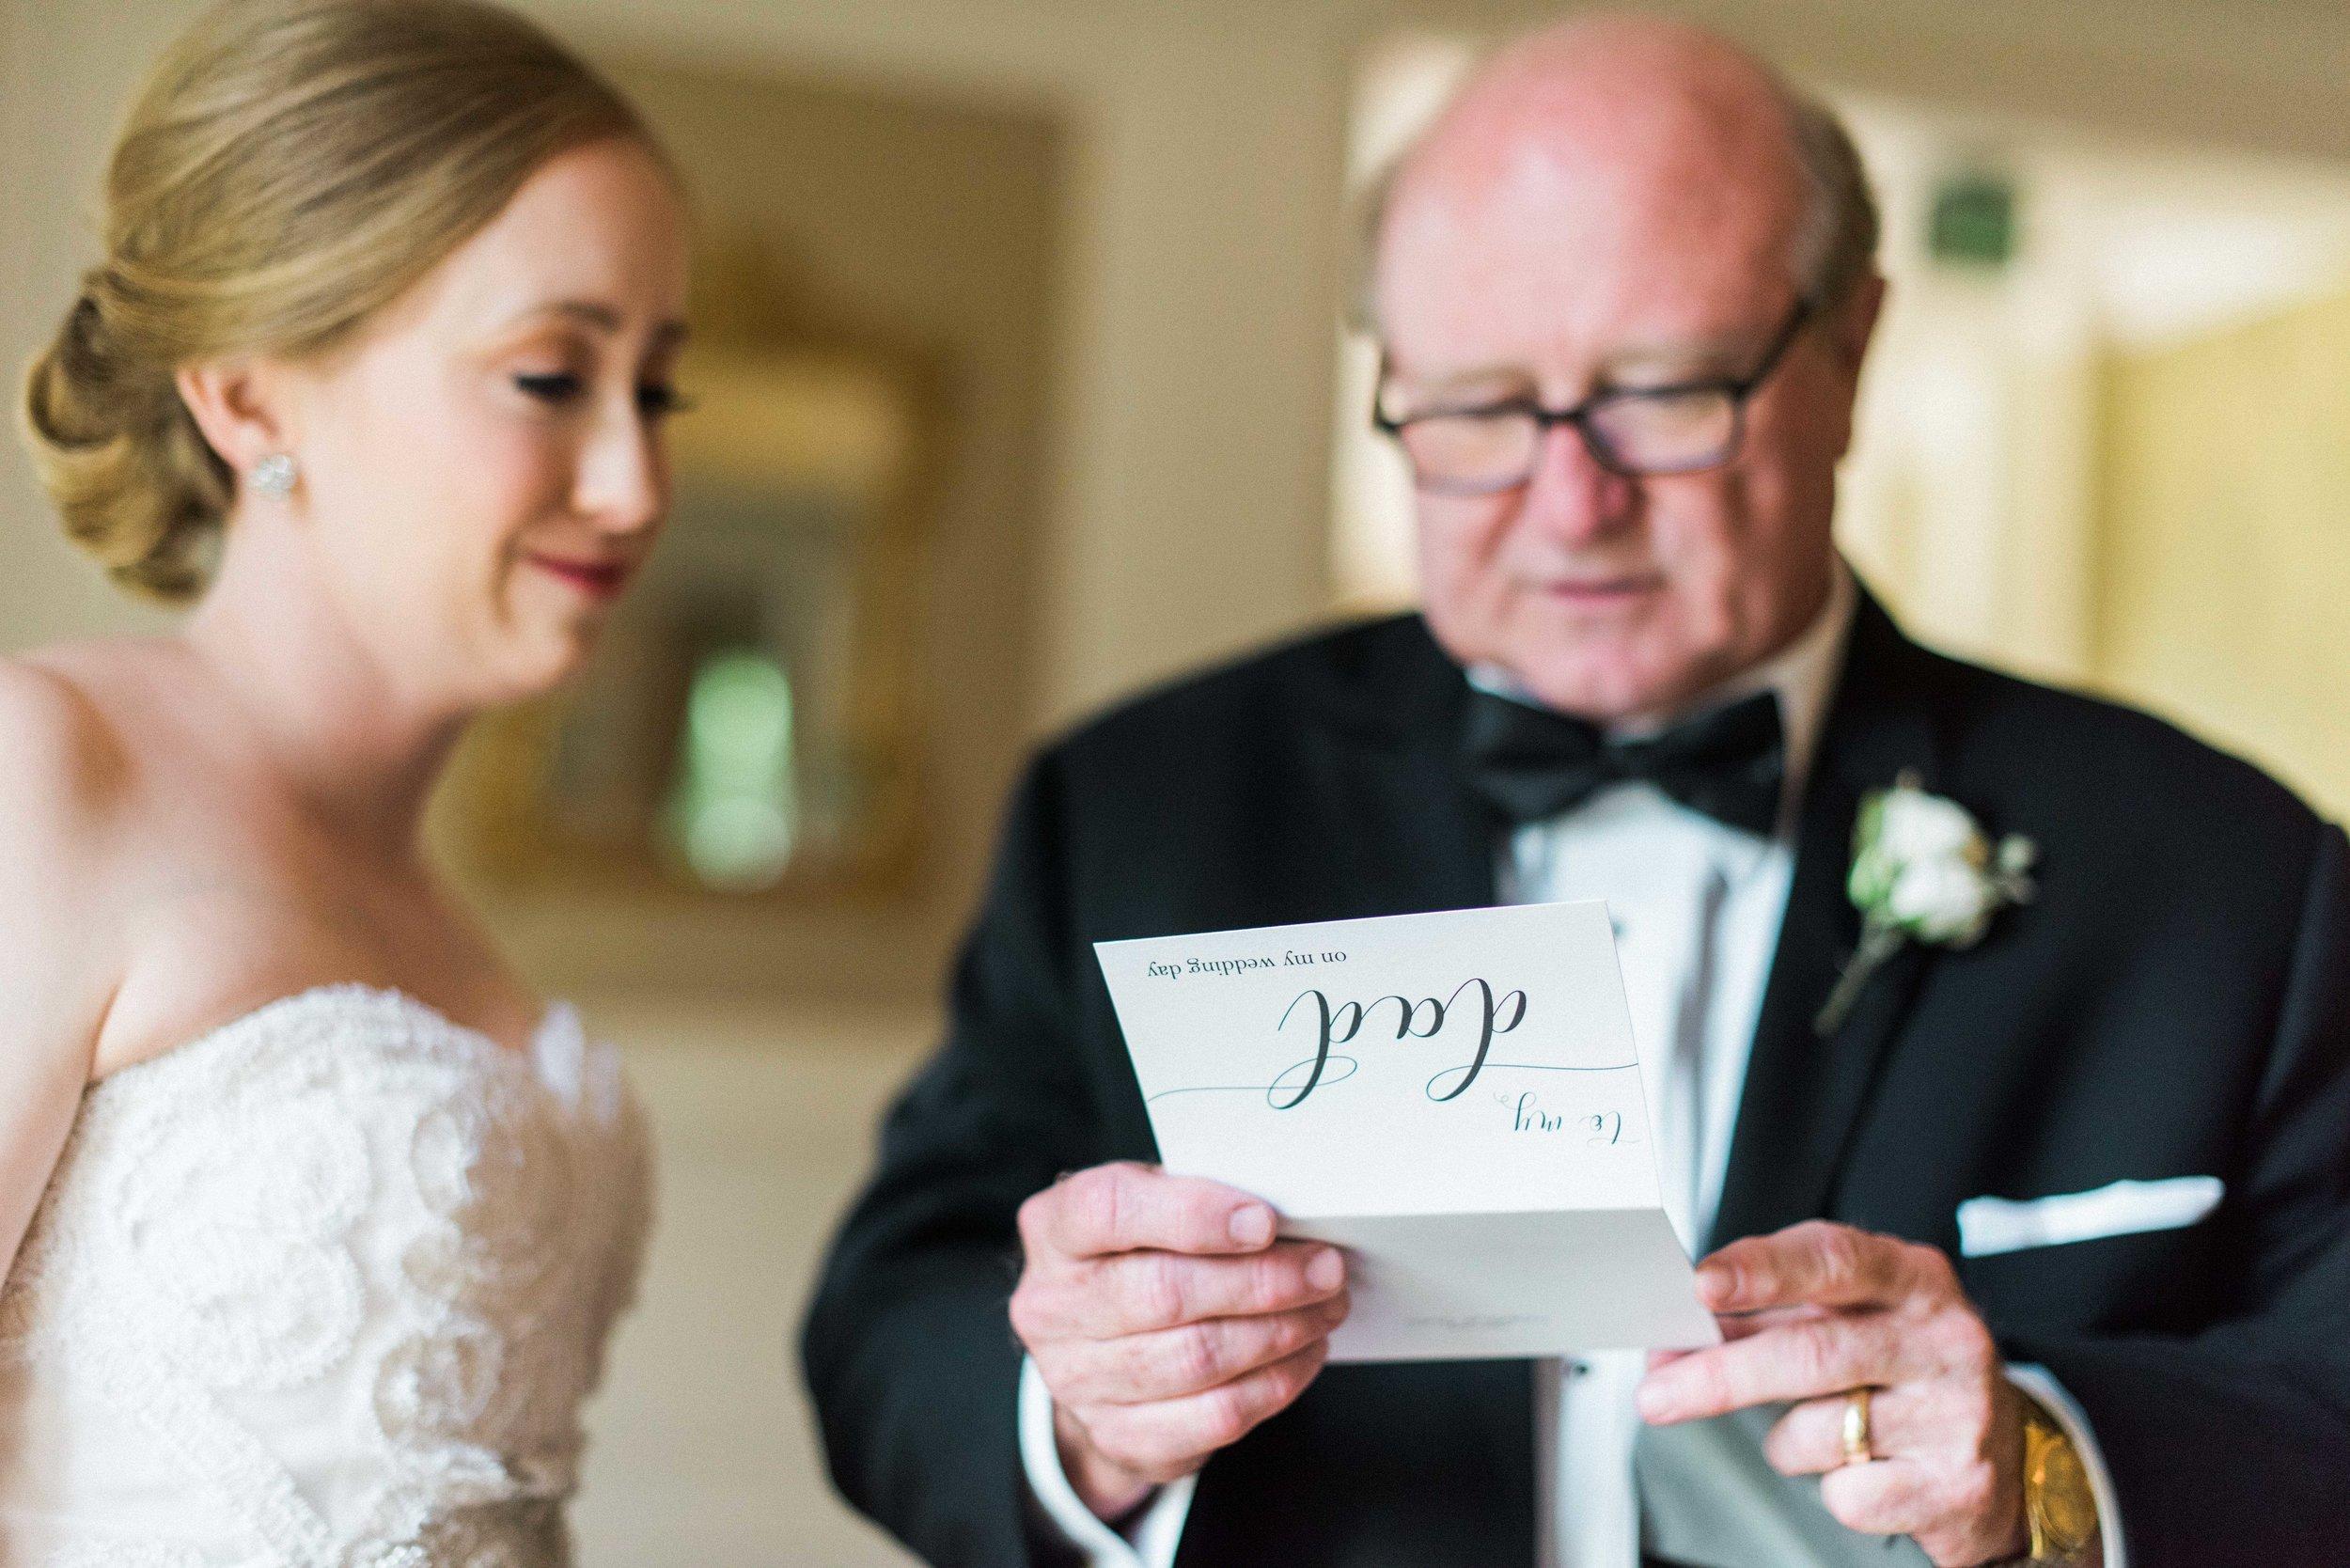 Fine-Art-Film-Houston-Wedding-Photographer-Best-Top-Luxury-Texas-Austin-Dallas-Destination-Dana-Fernandez-Photography-River-Oaks-Country-Club-South-Main-Baptist-Ceremony-Reception-Wedding-8.jpg